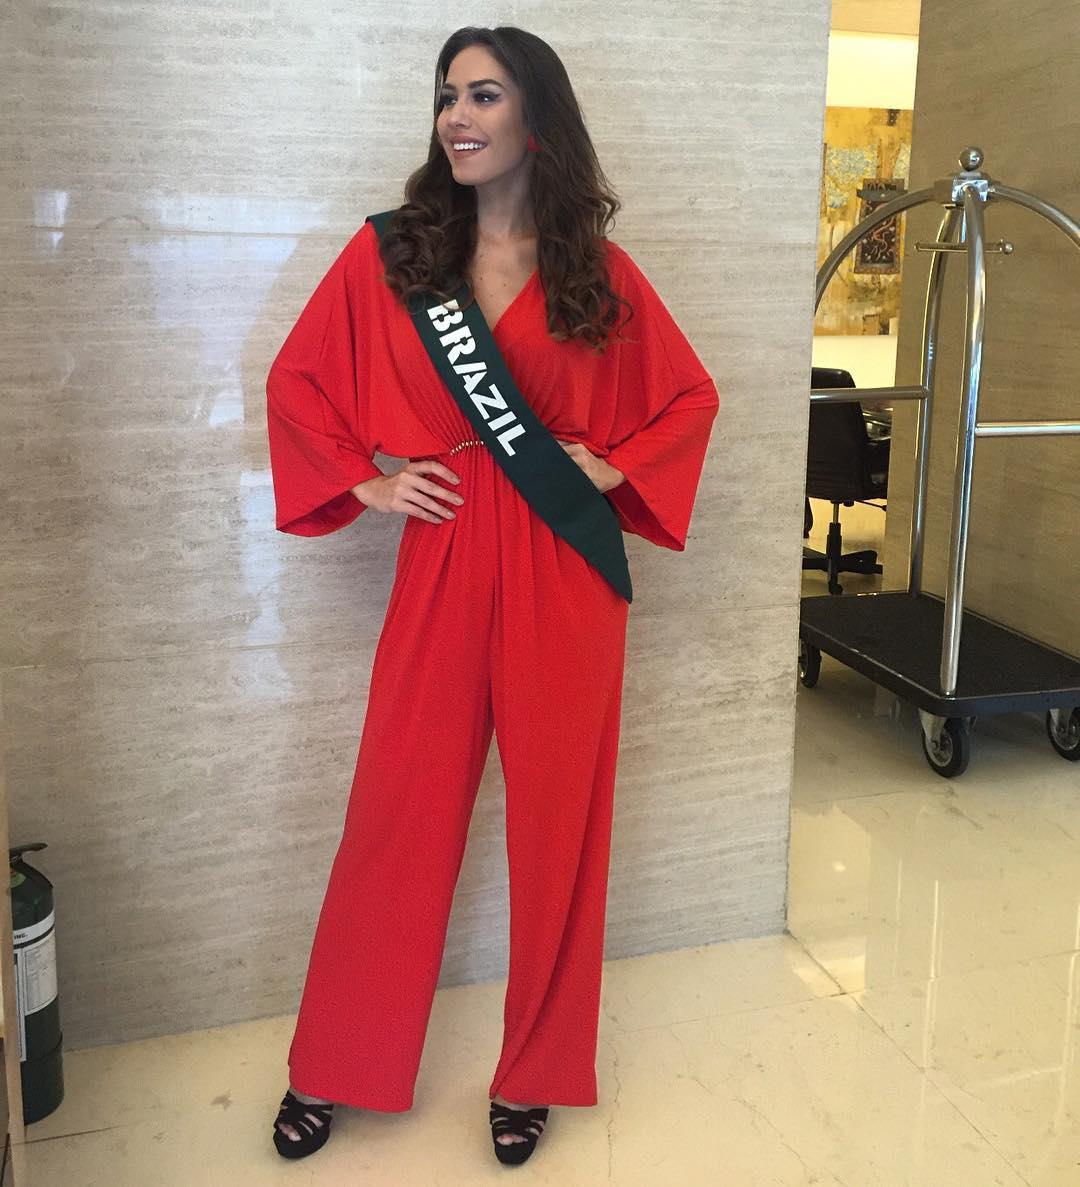 bruna zanardo, 1st runner-up de miss supranational brazil 2020/miss brasil internacional 2017/miss brasil terra 2016. - Página 4 Obal3xcj